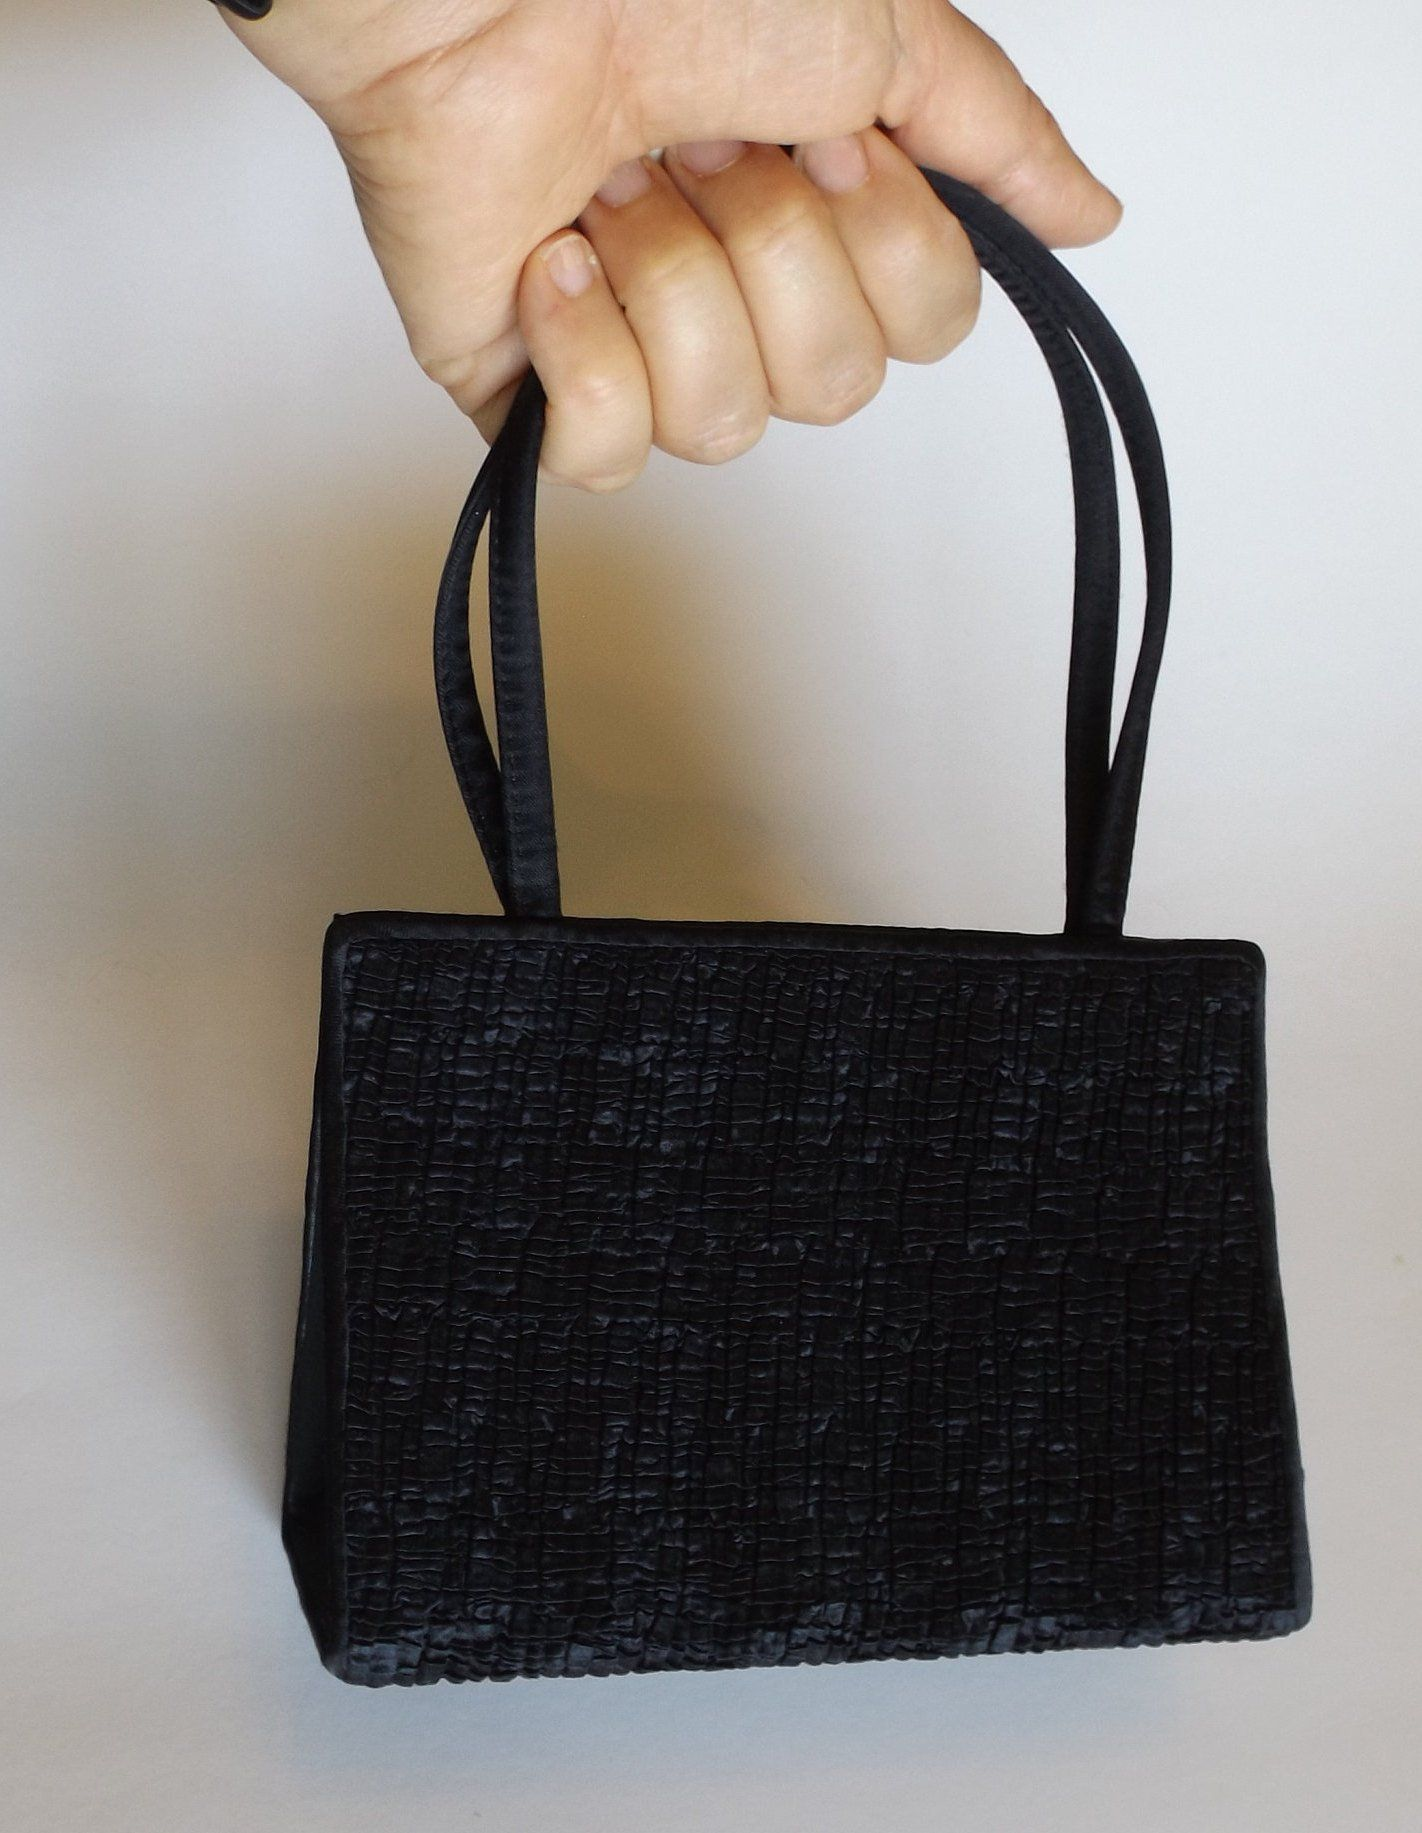 Vintage Black Purse Handbag Accessory Clothing Small Dressy Minimalist Elegant Evening By Dianasjoy On